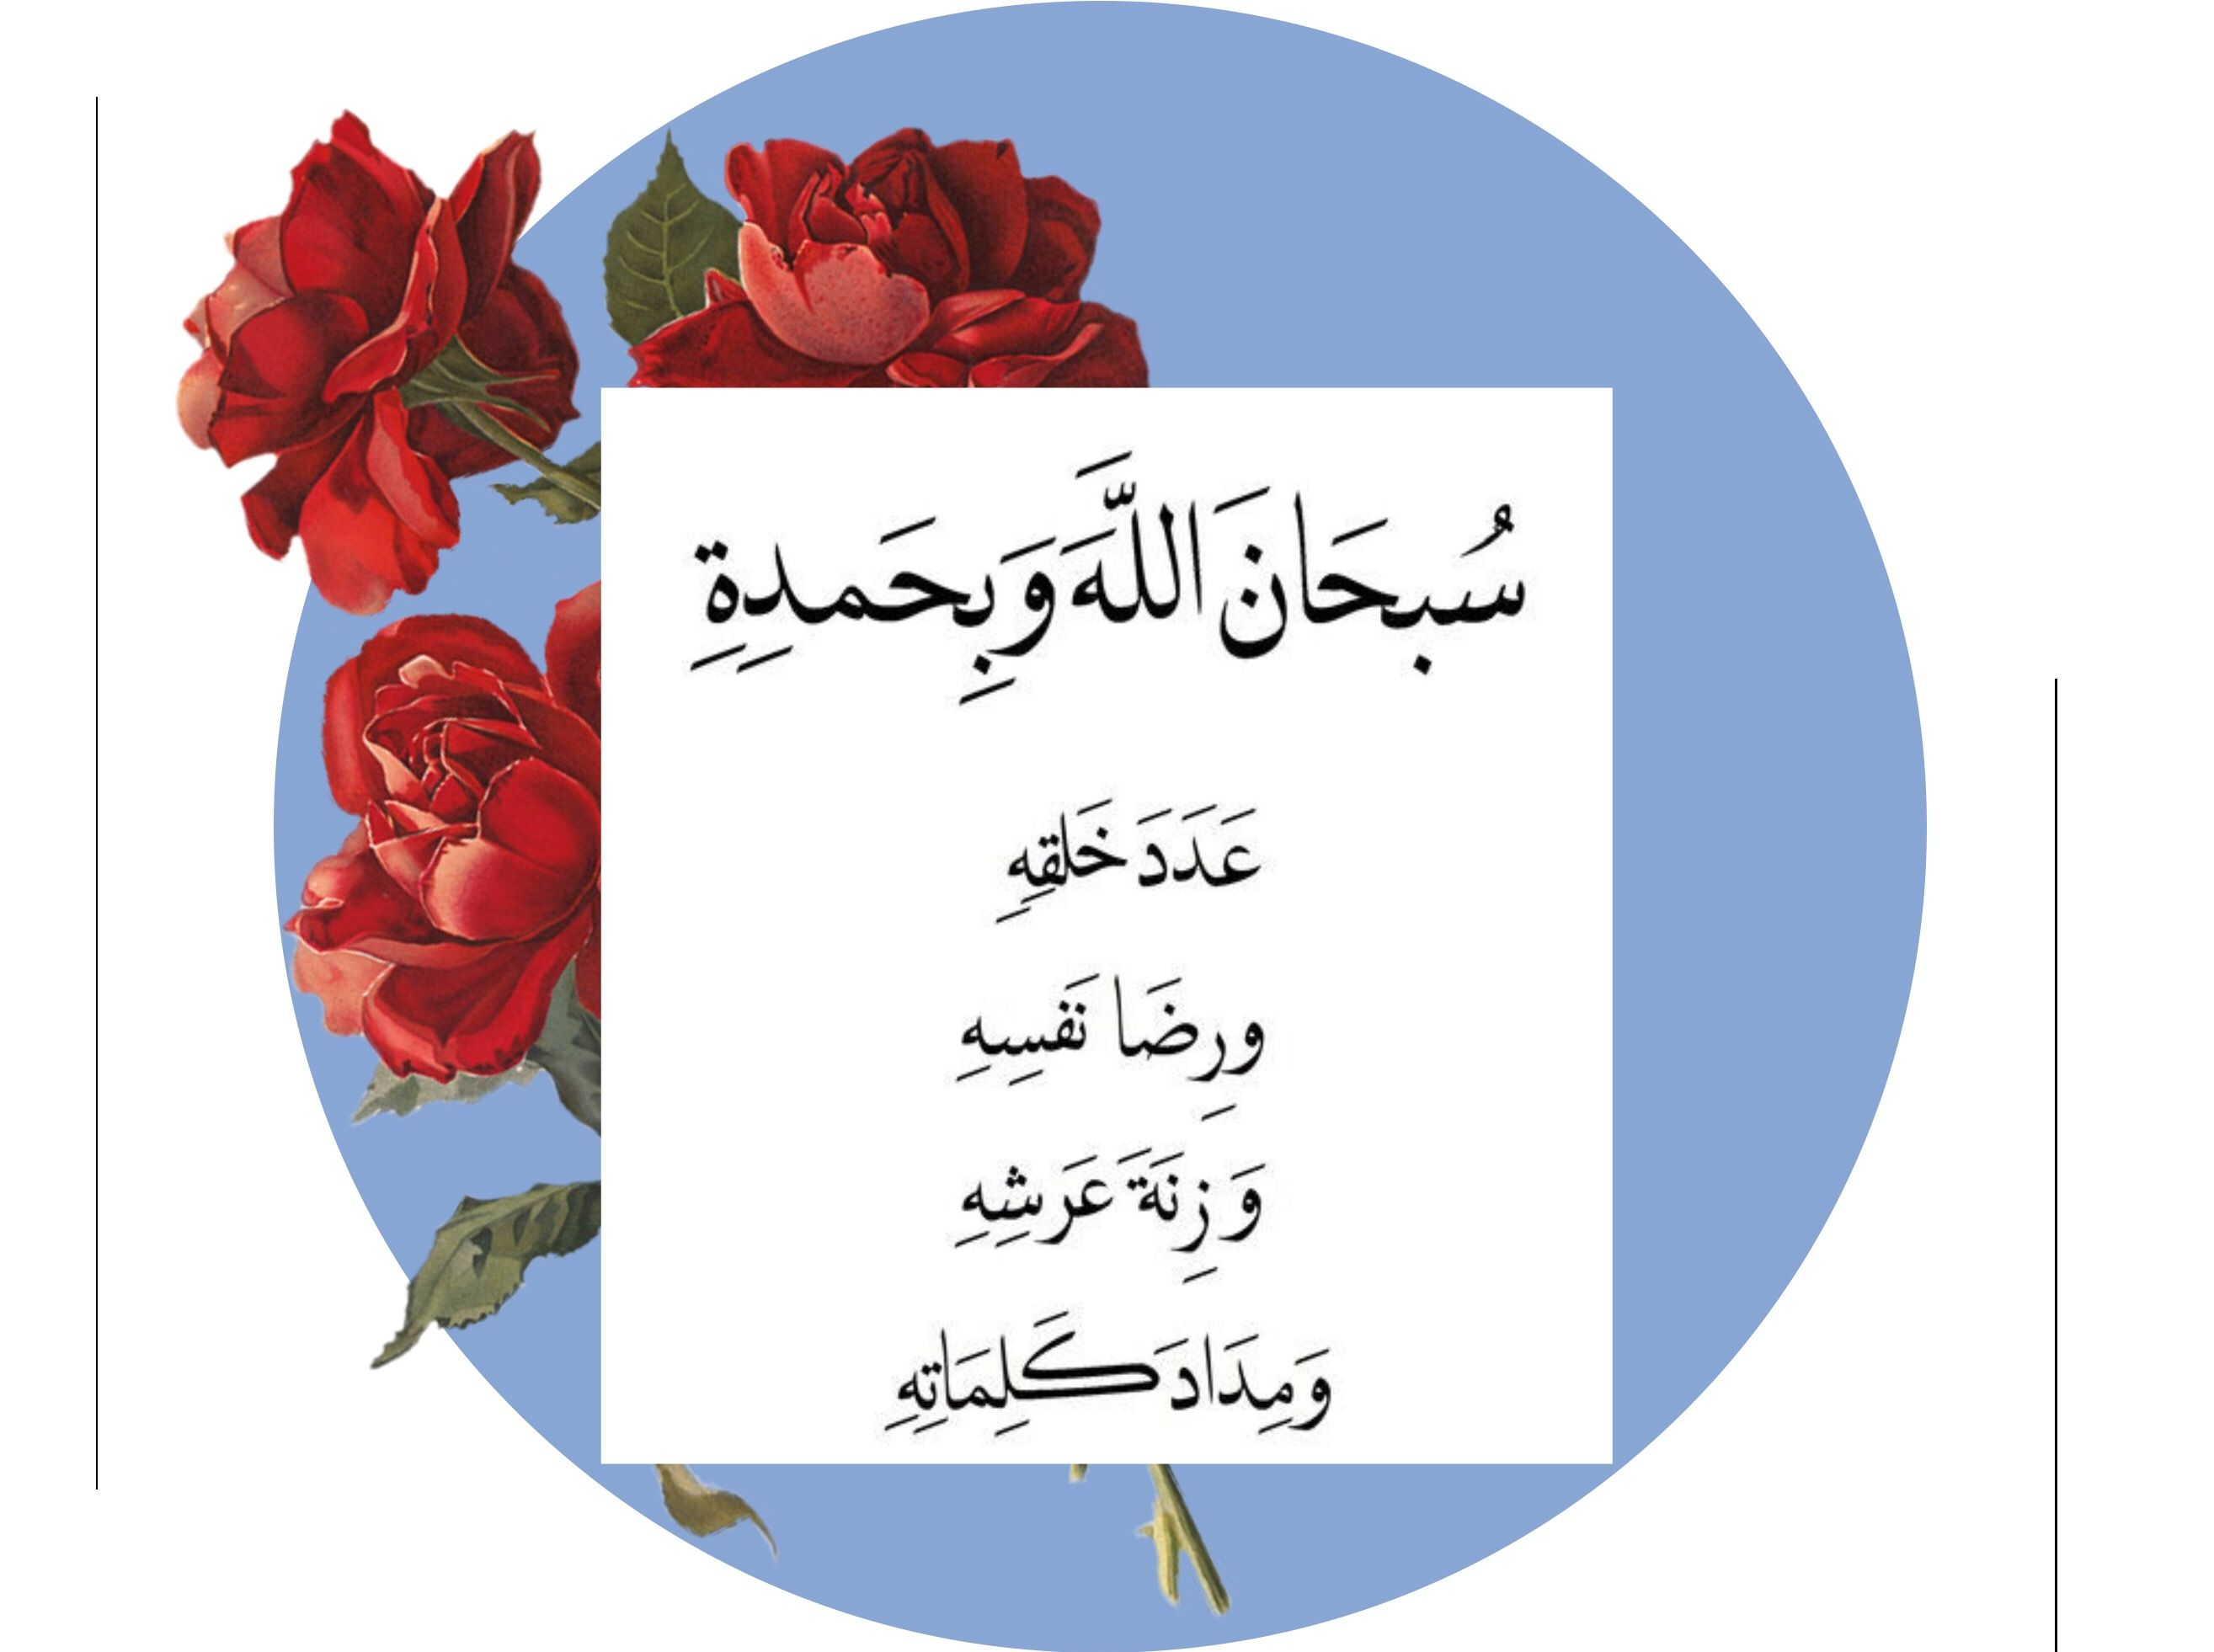 Pin By White Paperr1 On أدعية و أذكار Islamic Quotes Quran Sweet Words Doa Islam